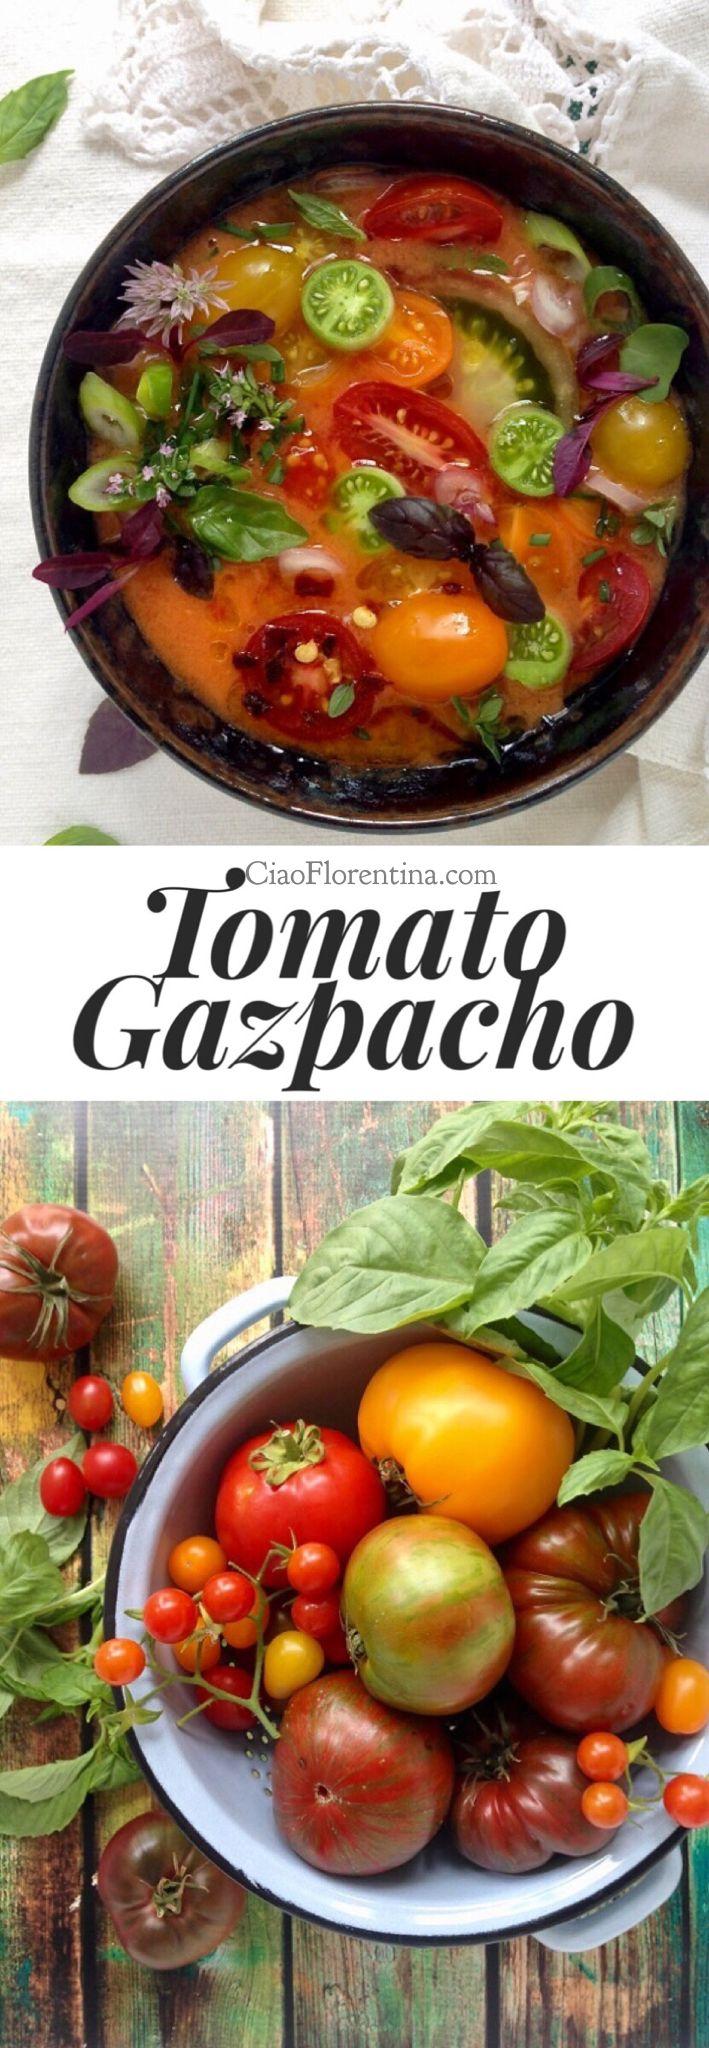 Heirloom Tomato Gazpacho Soup Recipe with Cucumber, Basil and Scallions | CiaoFlorentina.com @CiaoFlorentina